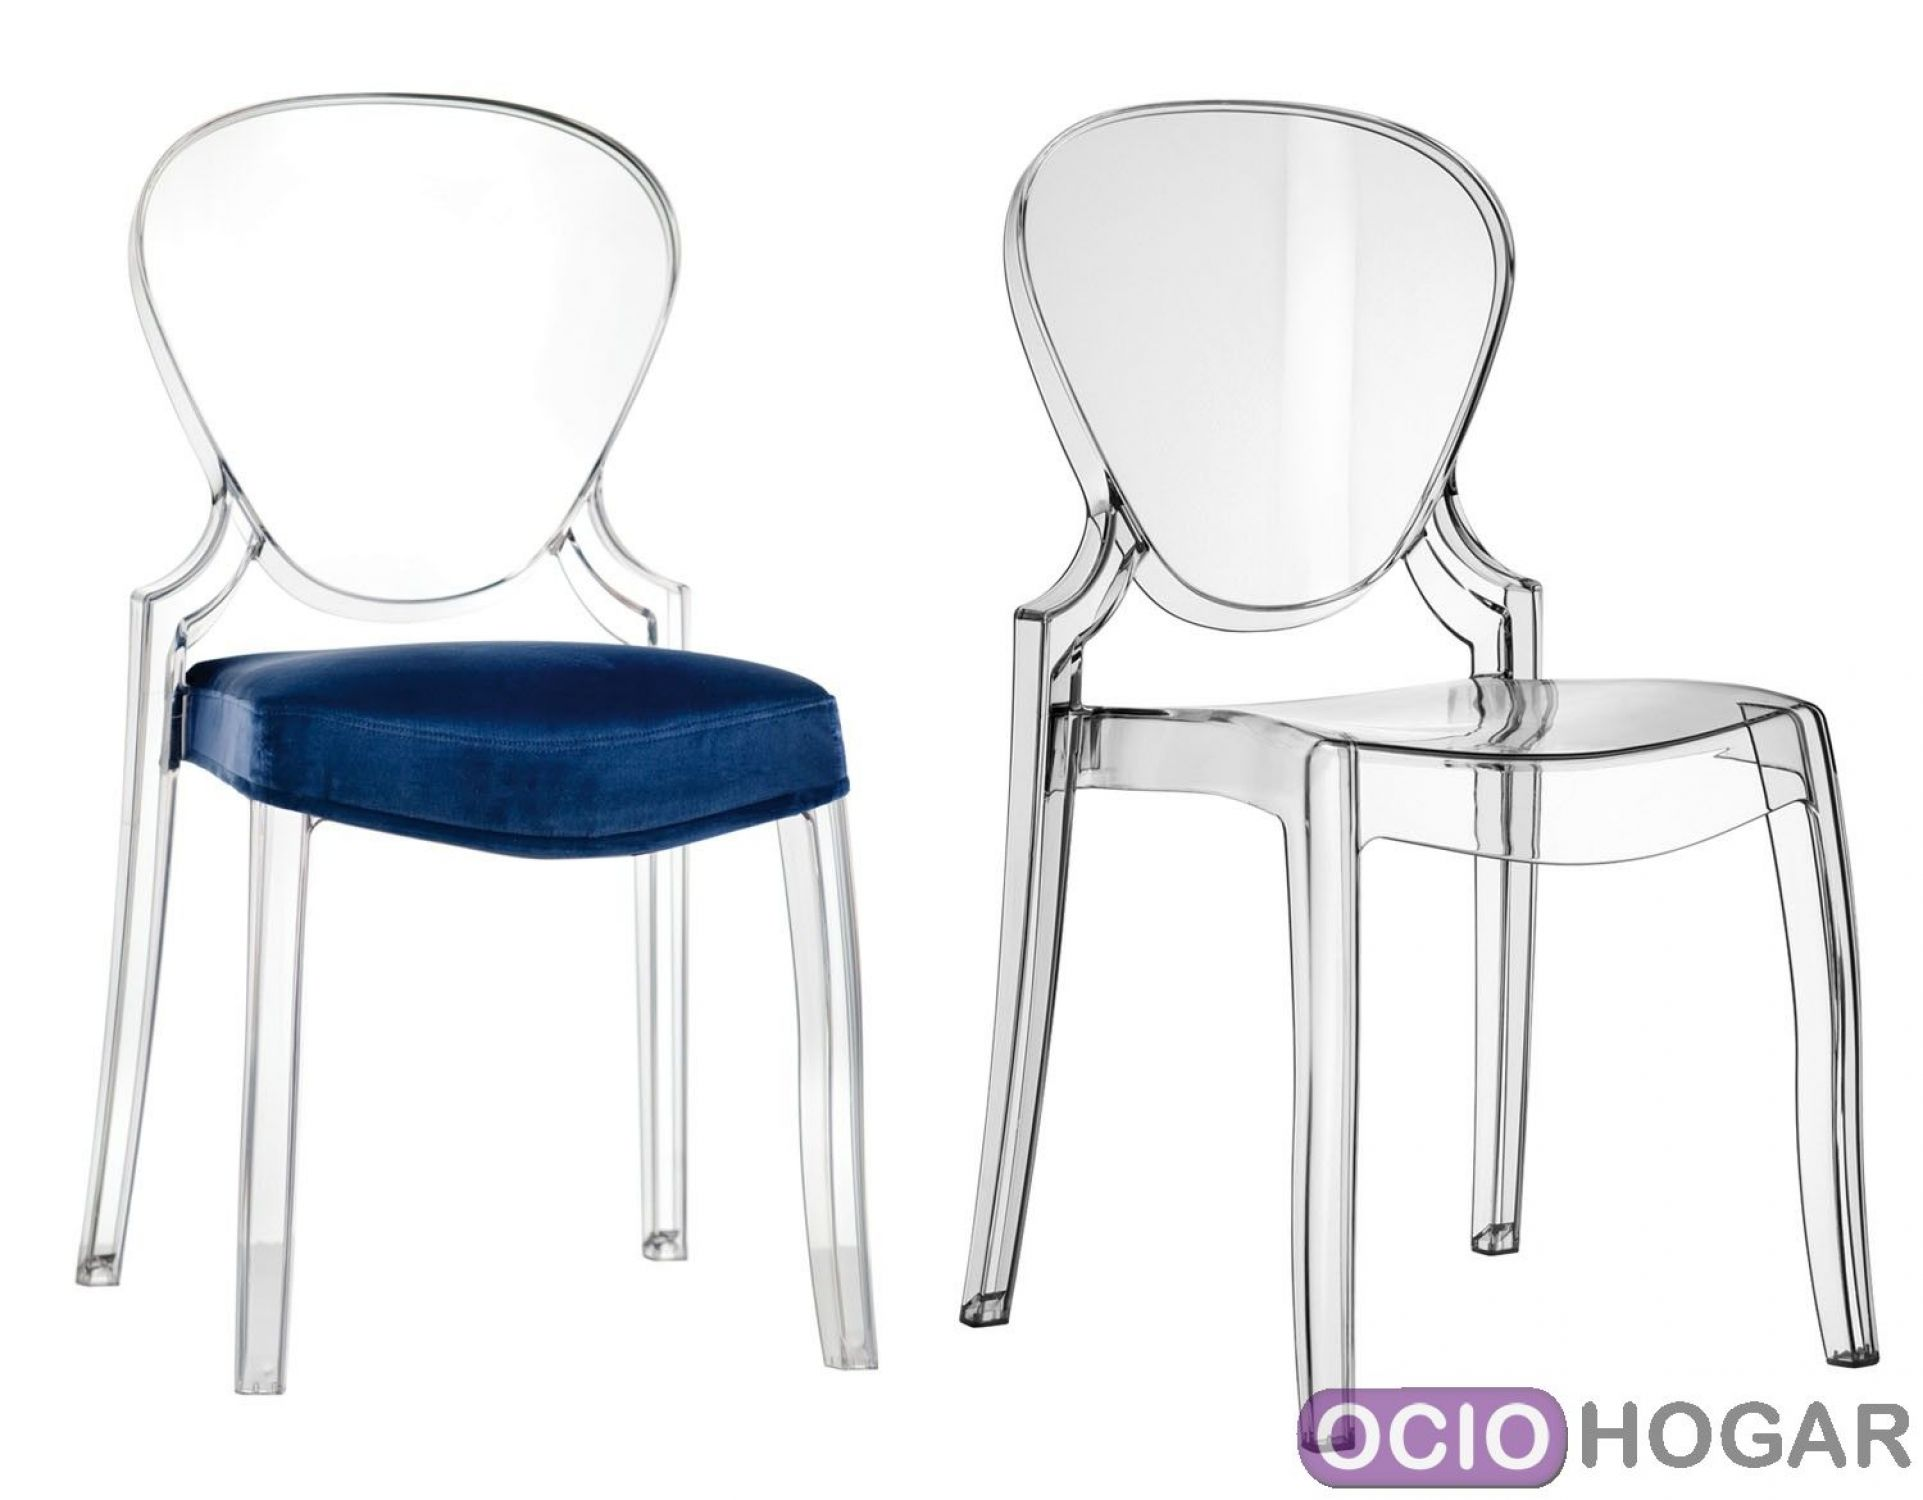 sillas de comedor transparentes de estilo moderno